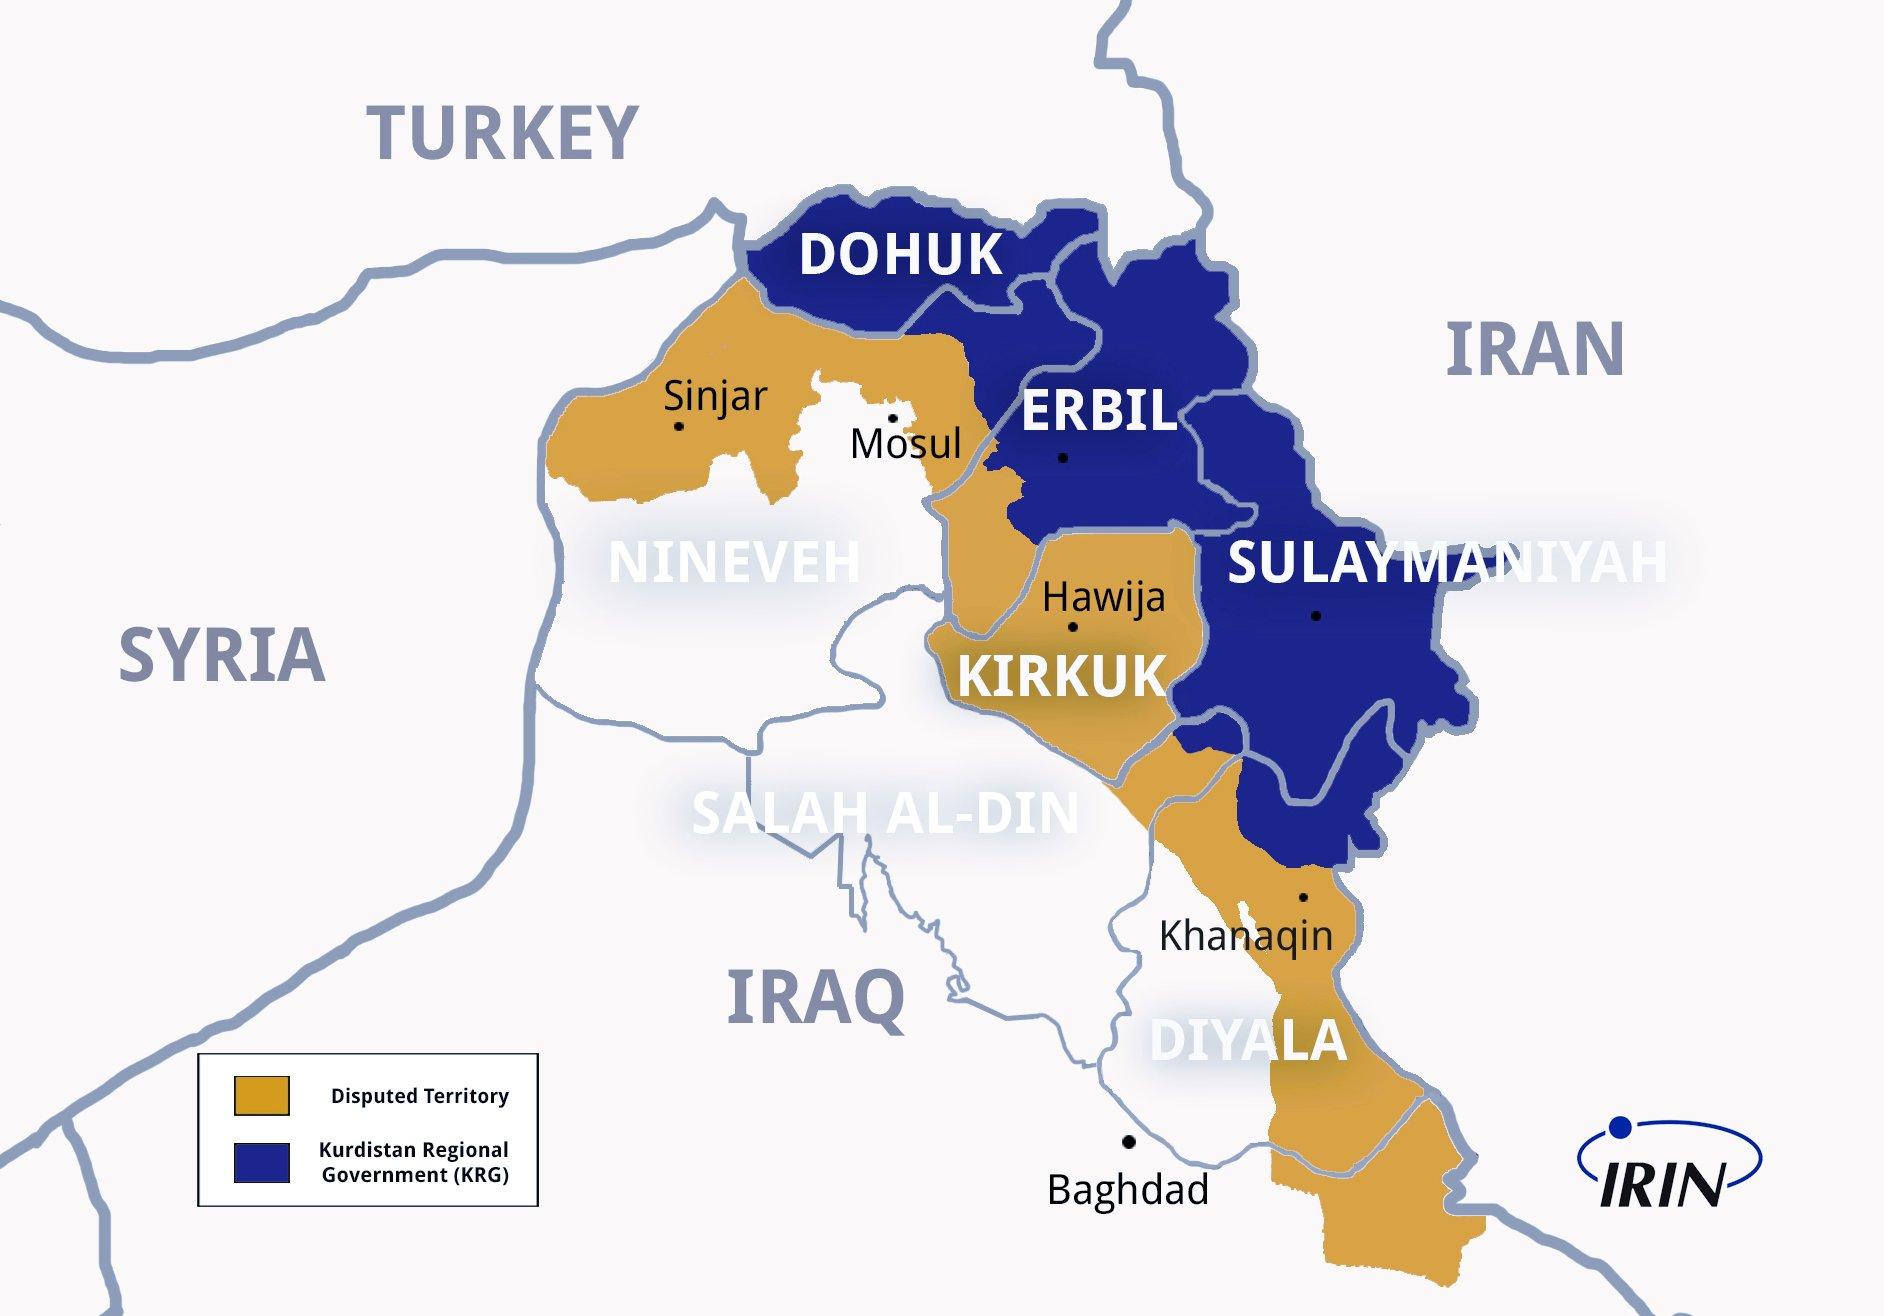 Ethnographic map of South #Kurdistan by @AryanShahrazur link: u.osmfr.org